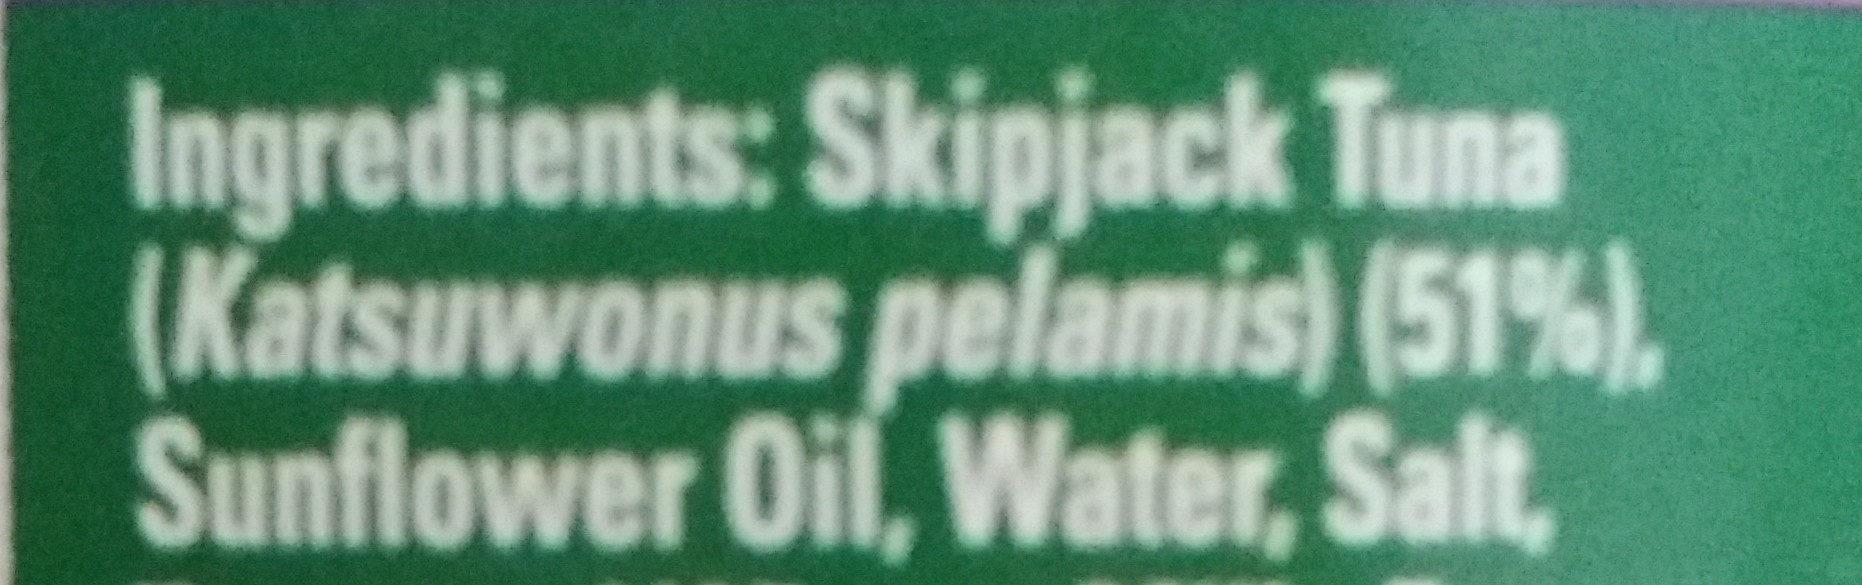 sandwich tuna flakes - Ingredients - en